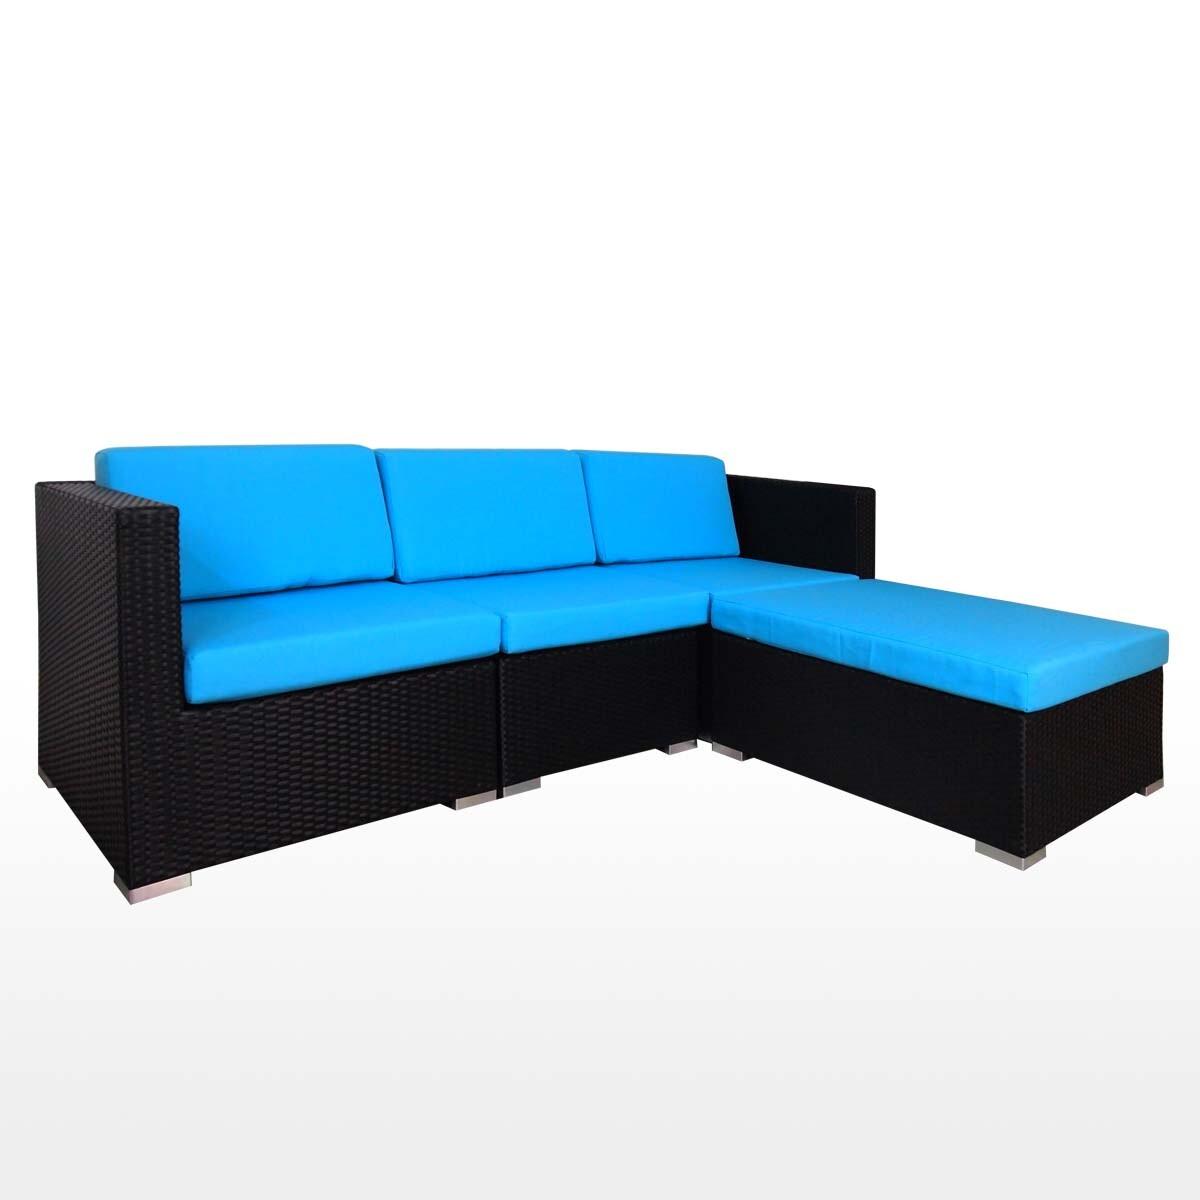 Summer outdoor modular sofa set ii blue cushions 2 year for Sofa modular exterior